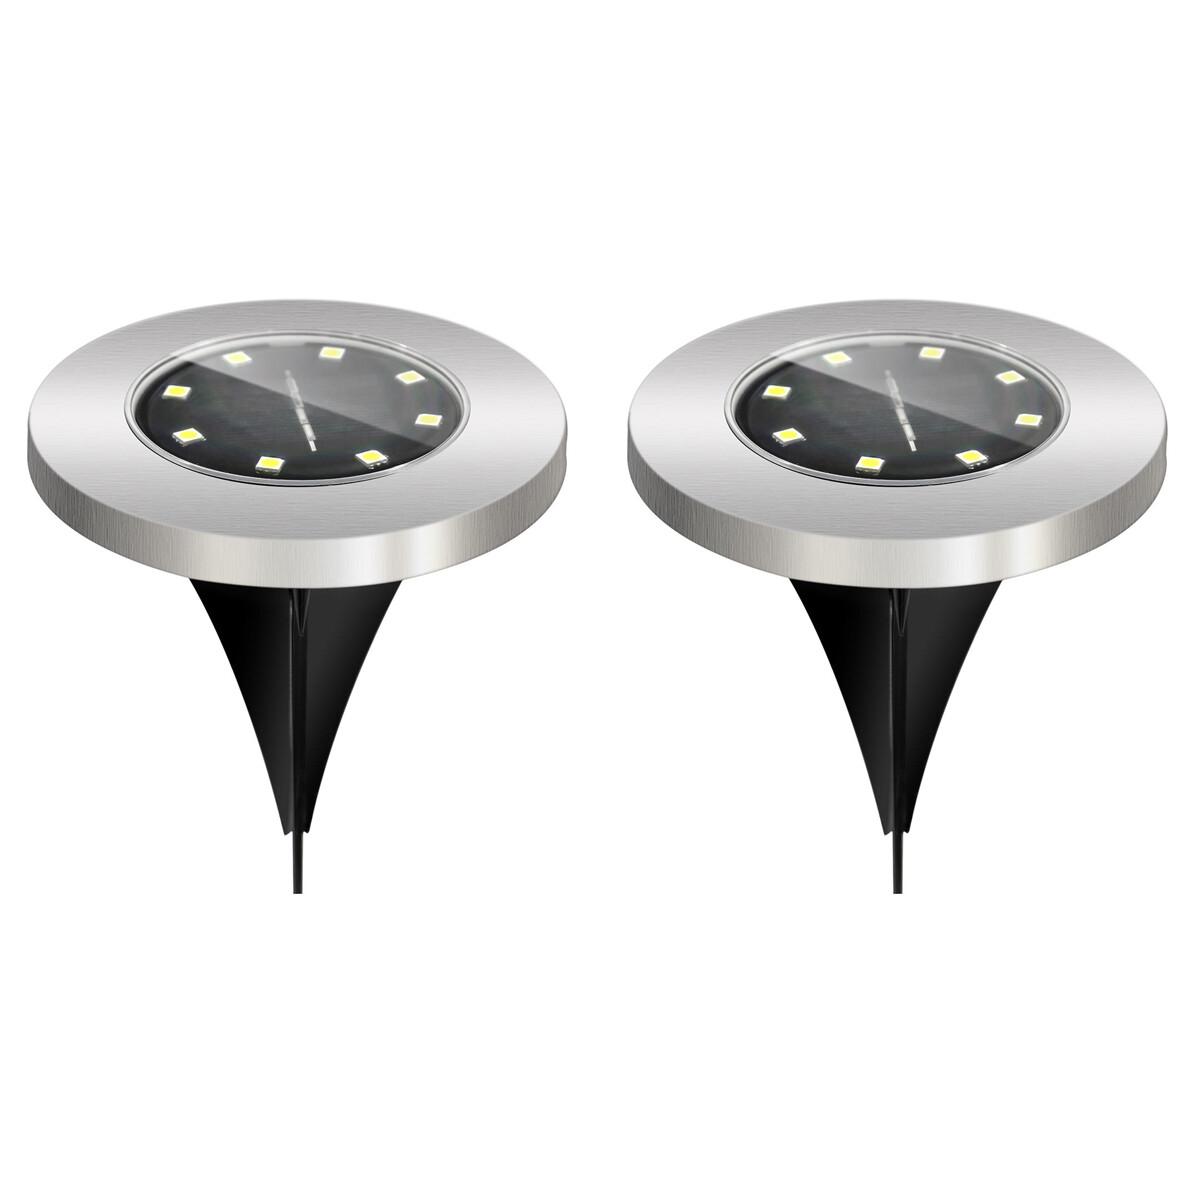 LED Grondspot met Zonne-energie - Set 2 Stuks - Aigi Grido - Inbouw Rond - 0.2W - Waterdicht IP44 -